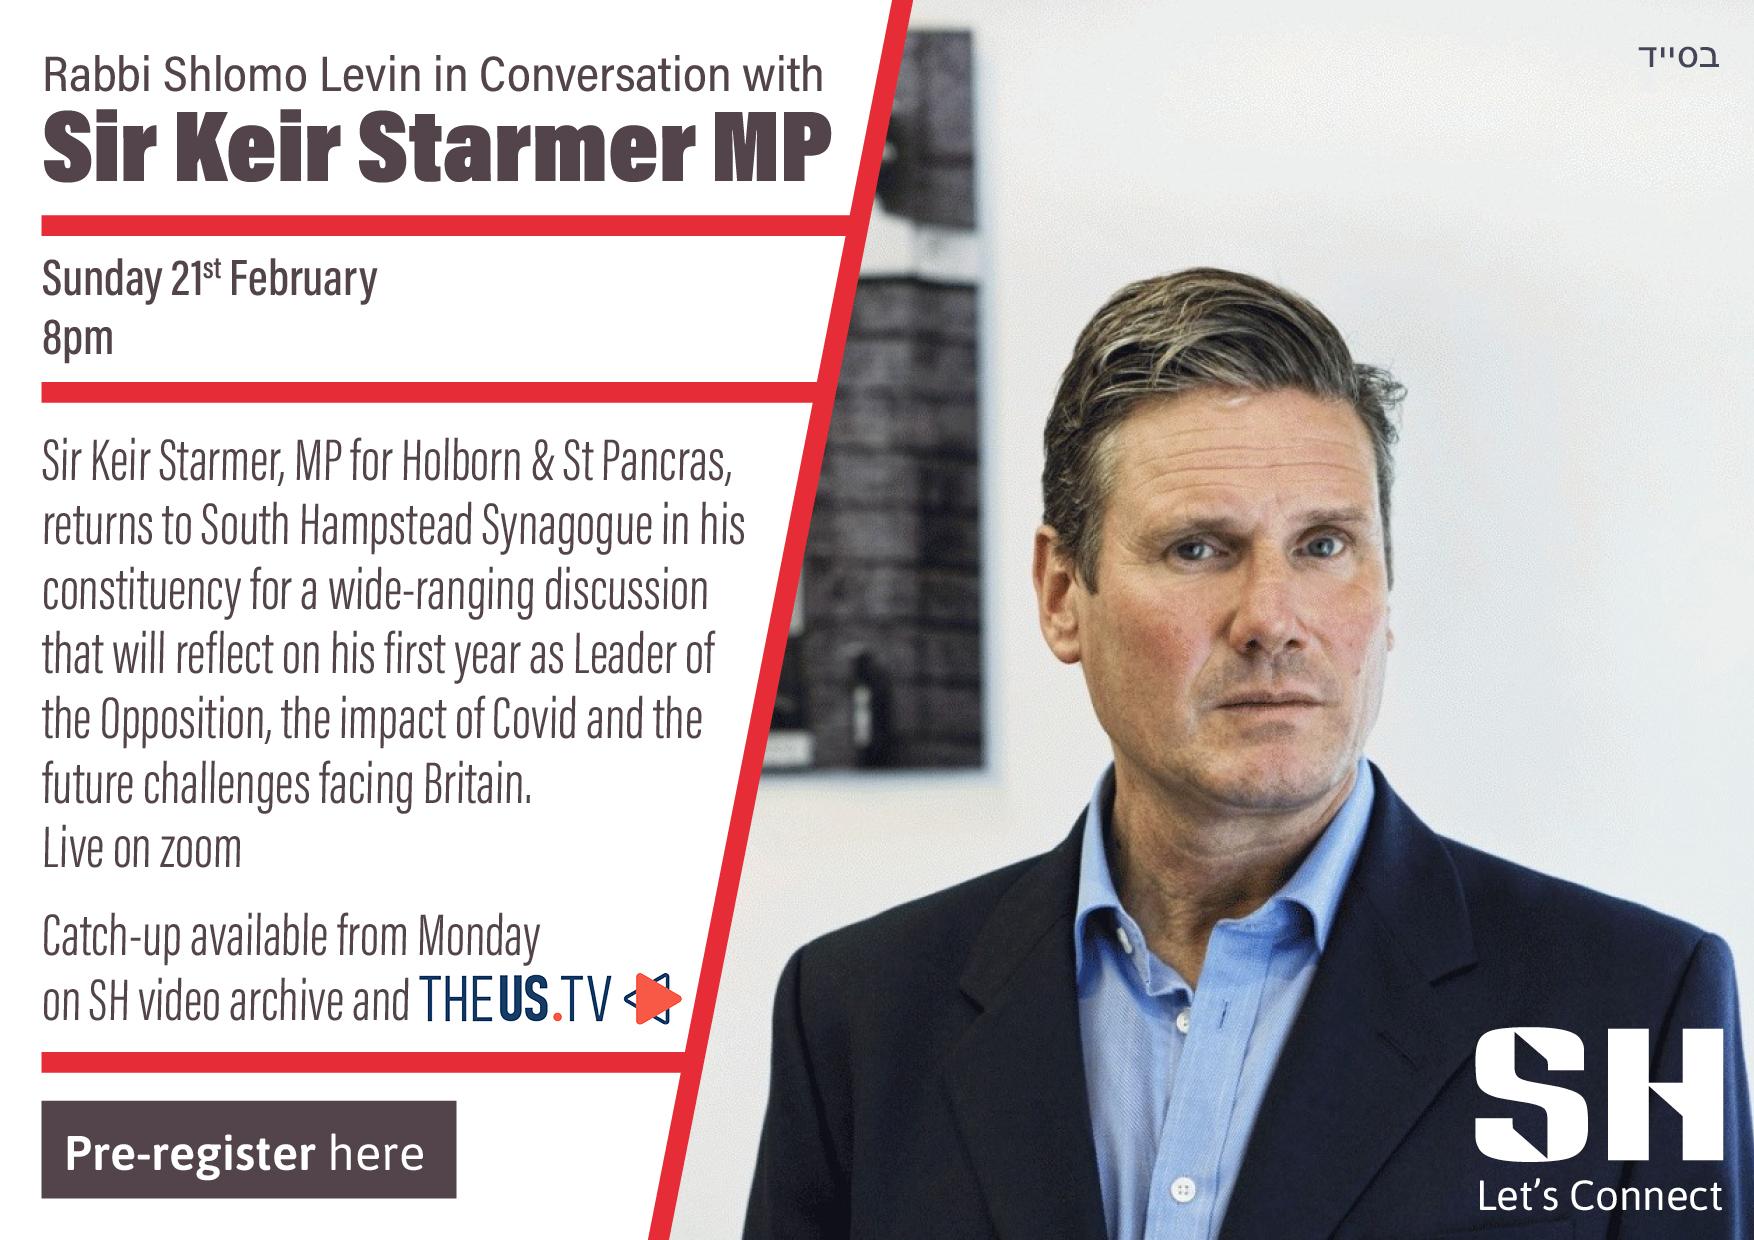 Sir Keir Starmer MP